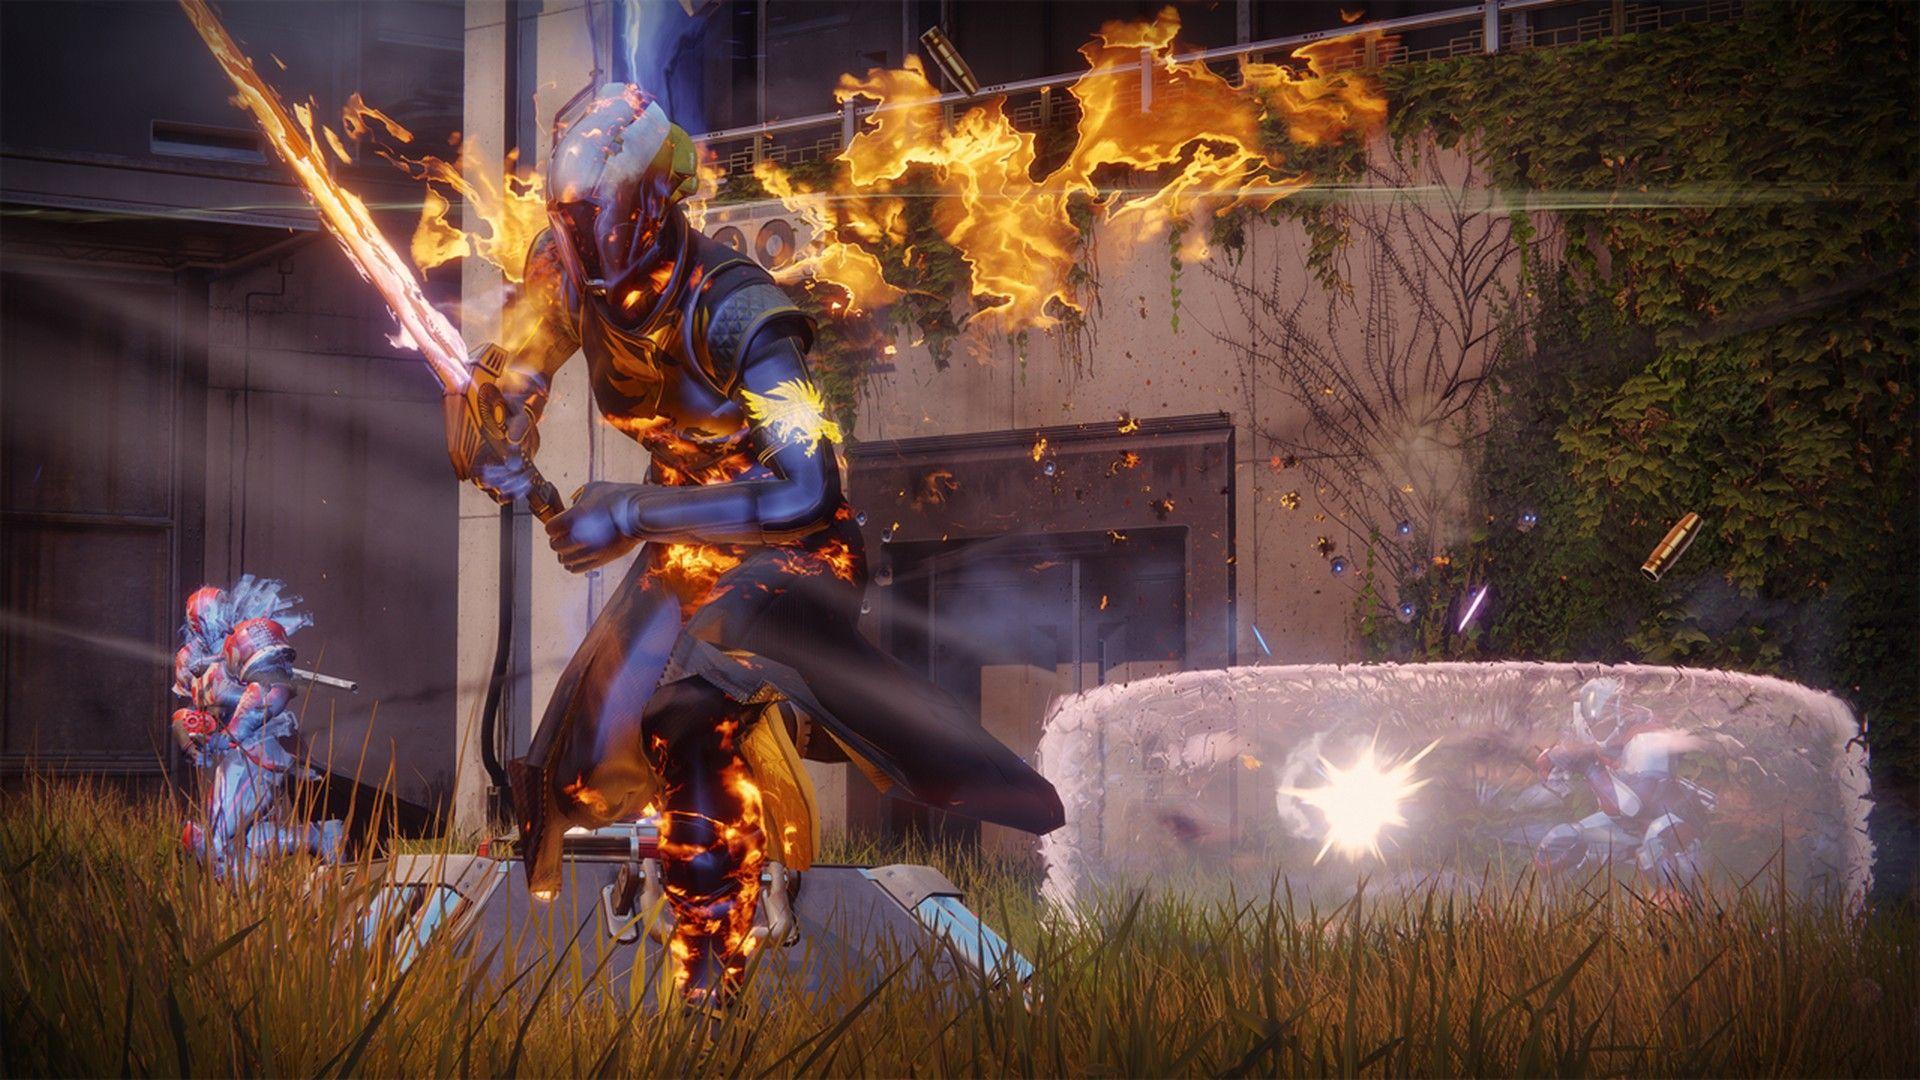 Destiny 2 Armor Fire Wallpaper Destiny, Live wallpapers